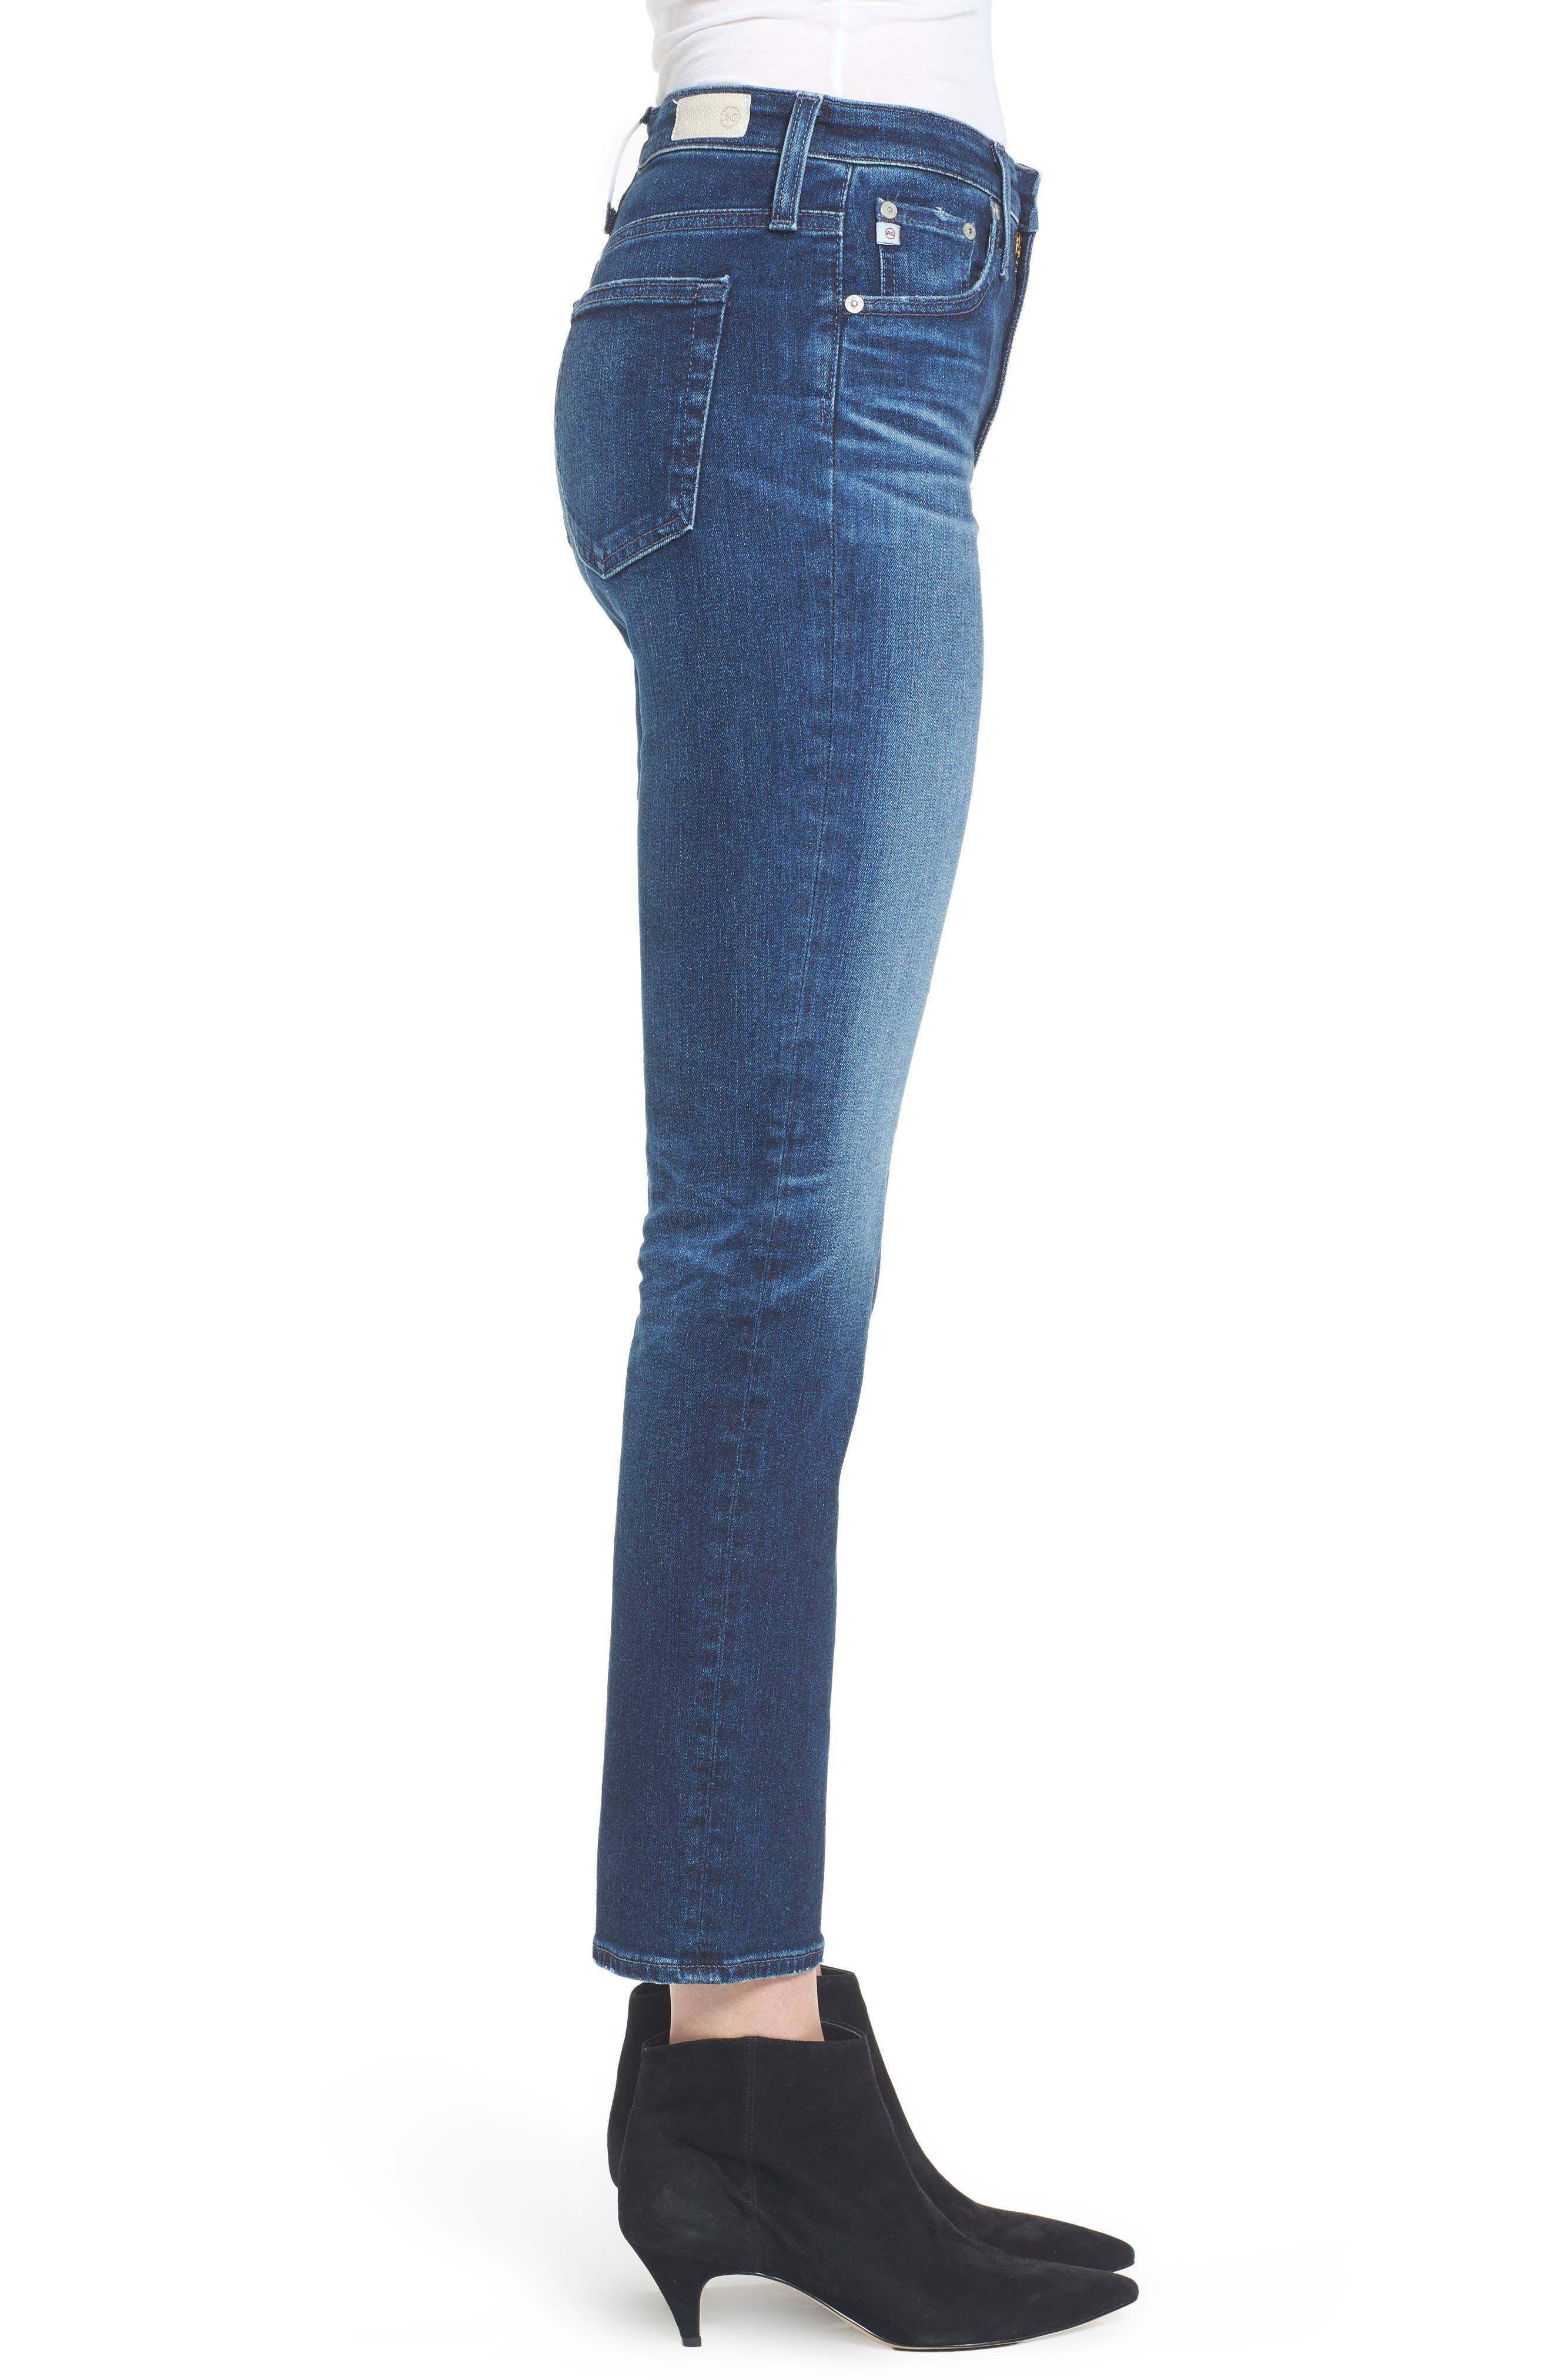 Alternate Image 3  - AG The Isabelle High Waist Crop Straight Leg Jeans (8 Years Ocean Tropic)